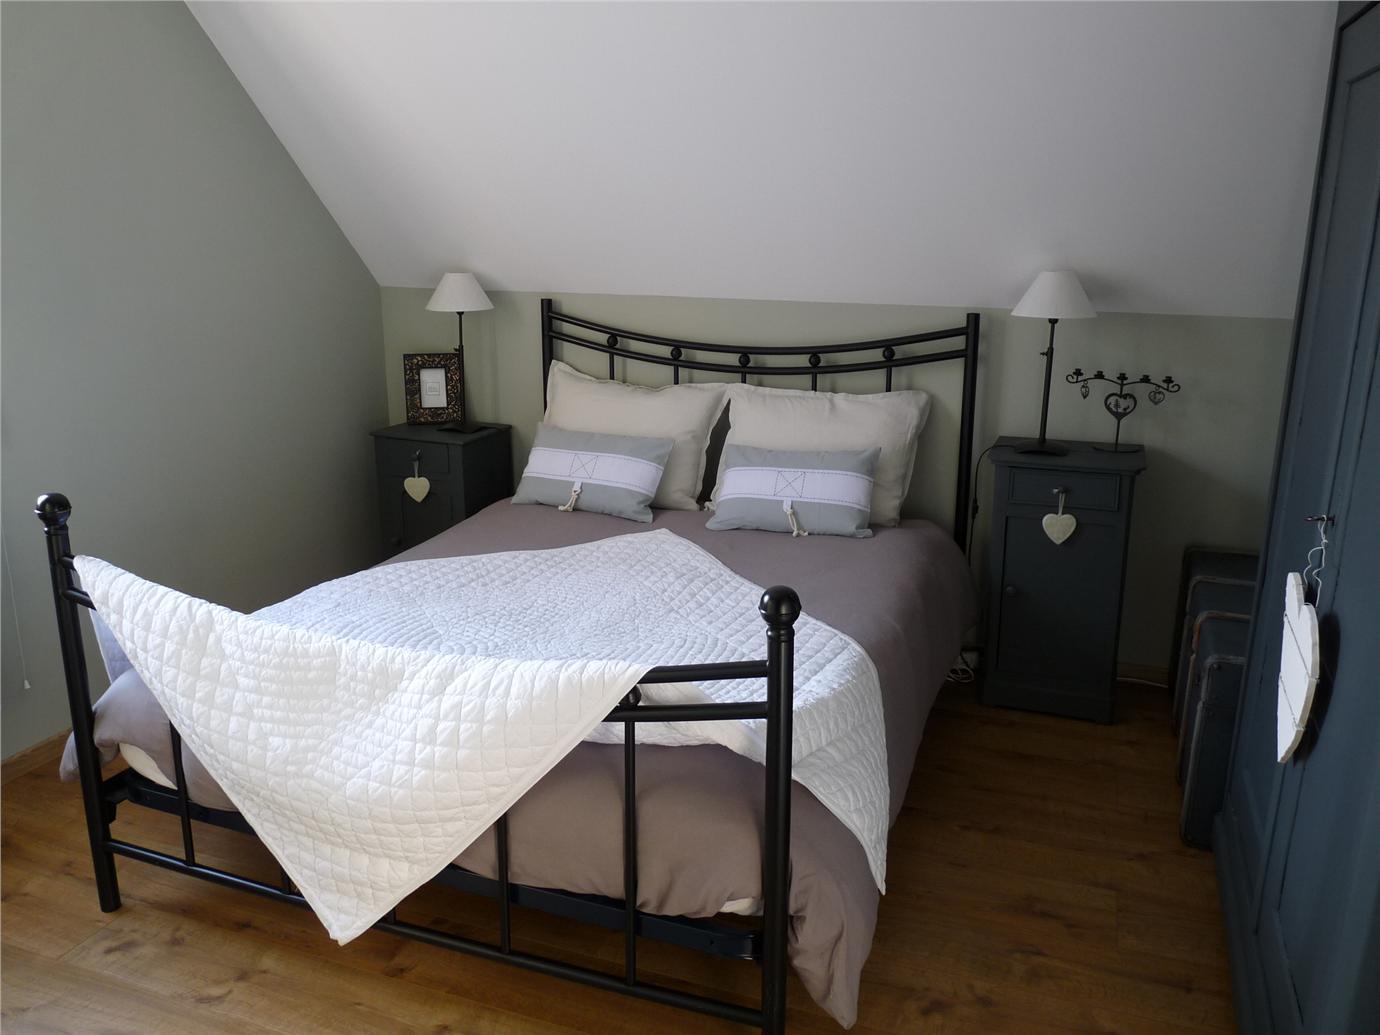 farrow ball mizzle 266 floor paint 0 75 eparket. Black Bedroom Furniture Sets. Home Design Ideas